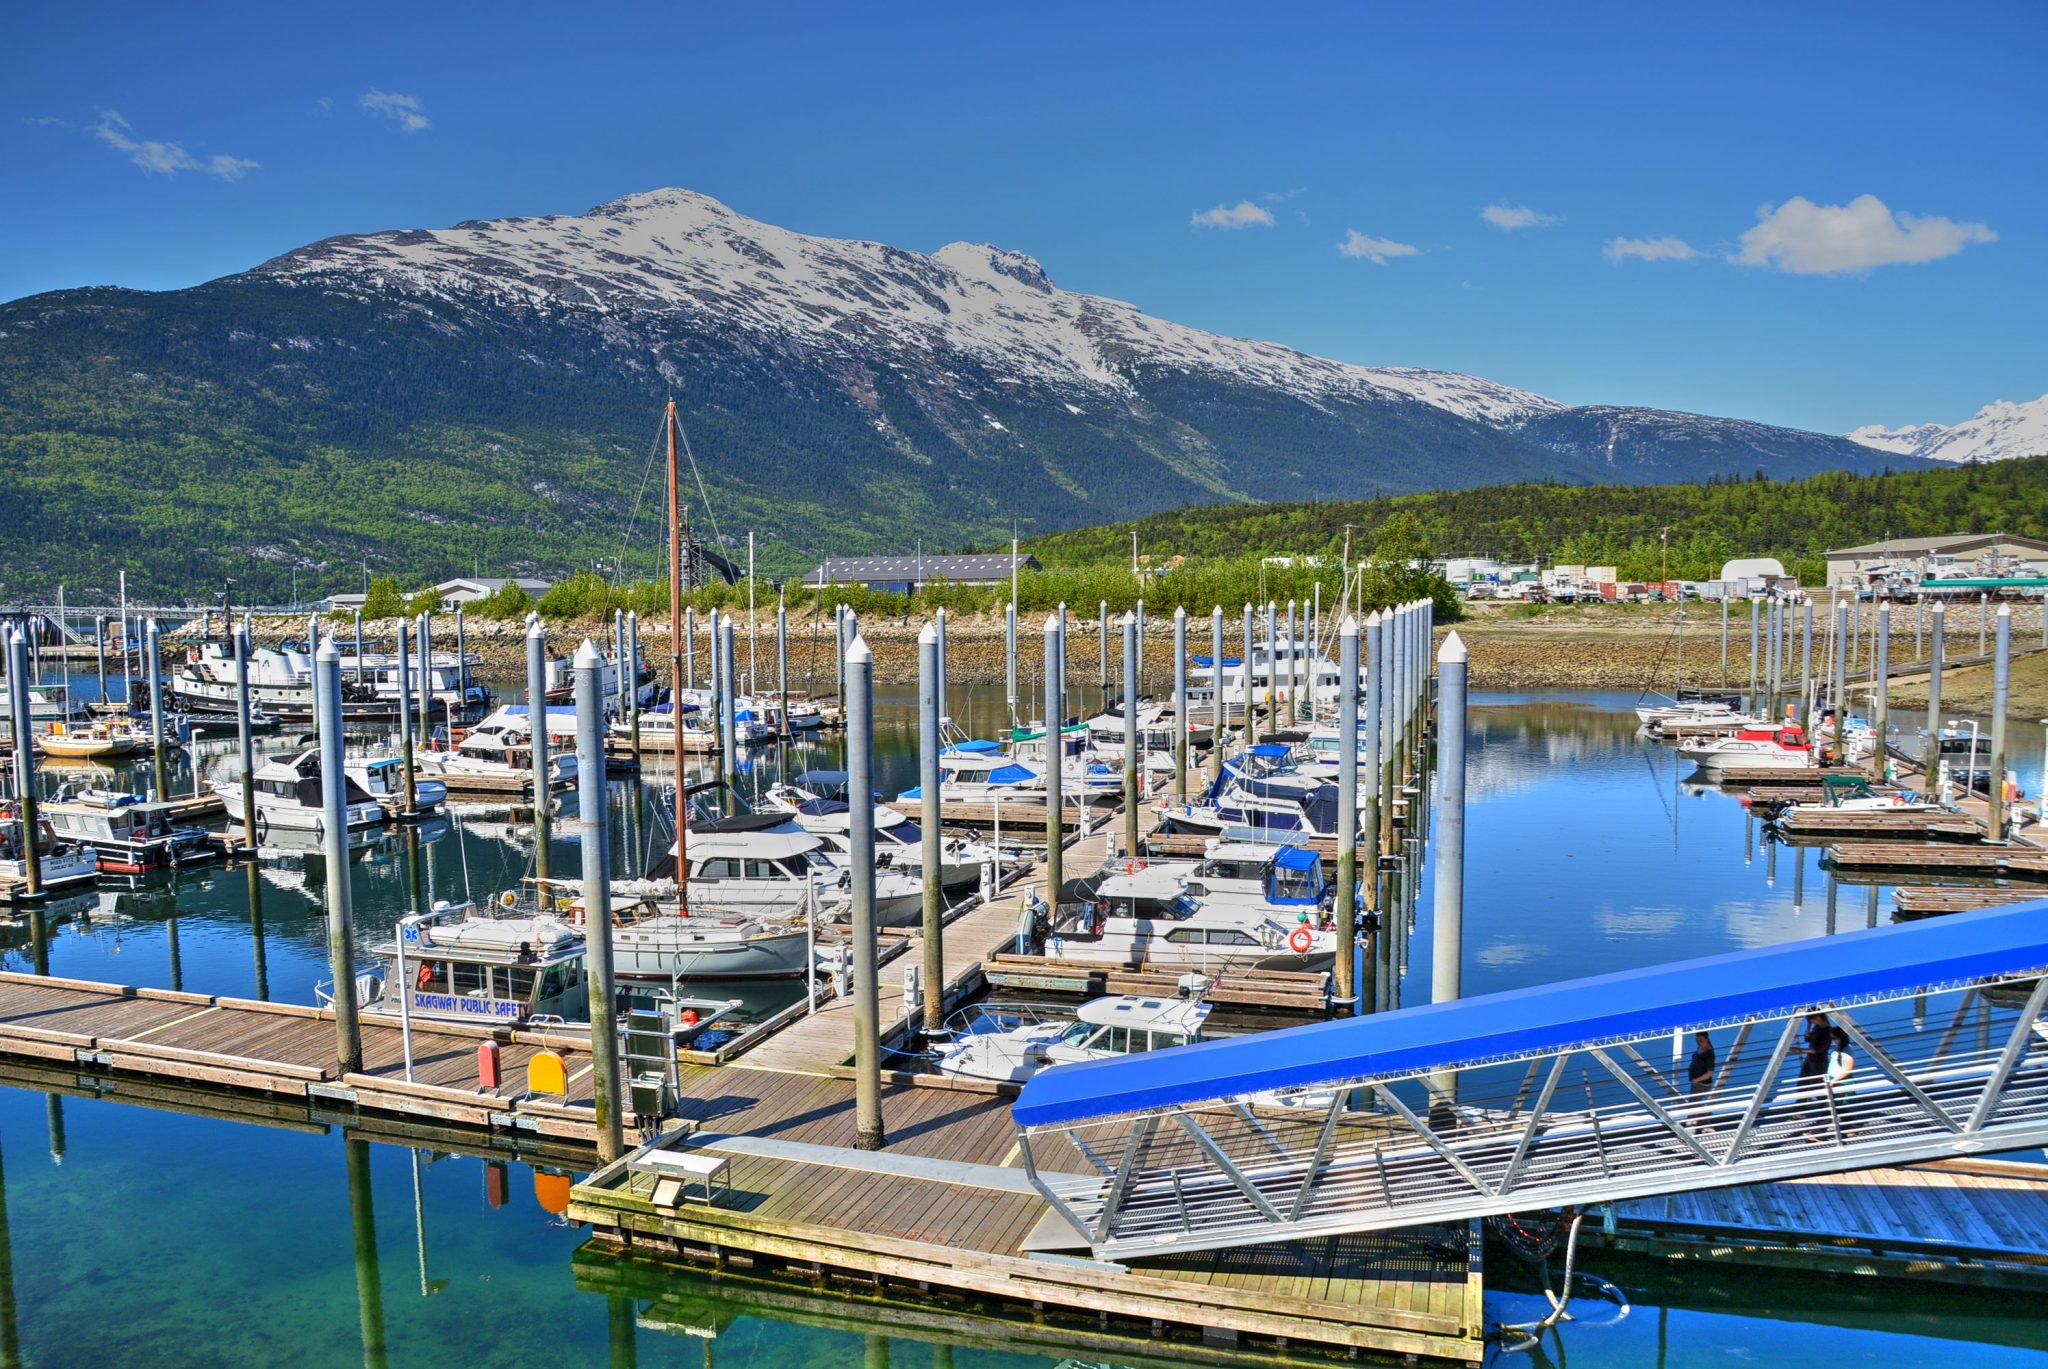 Our Alaskan cruise-Skagway